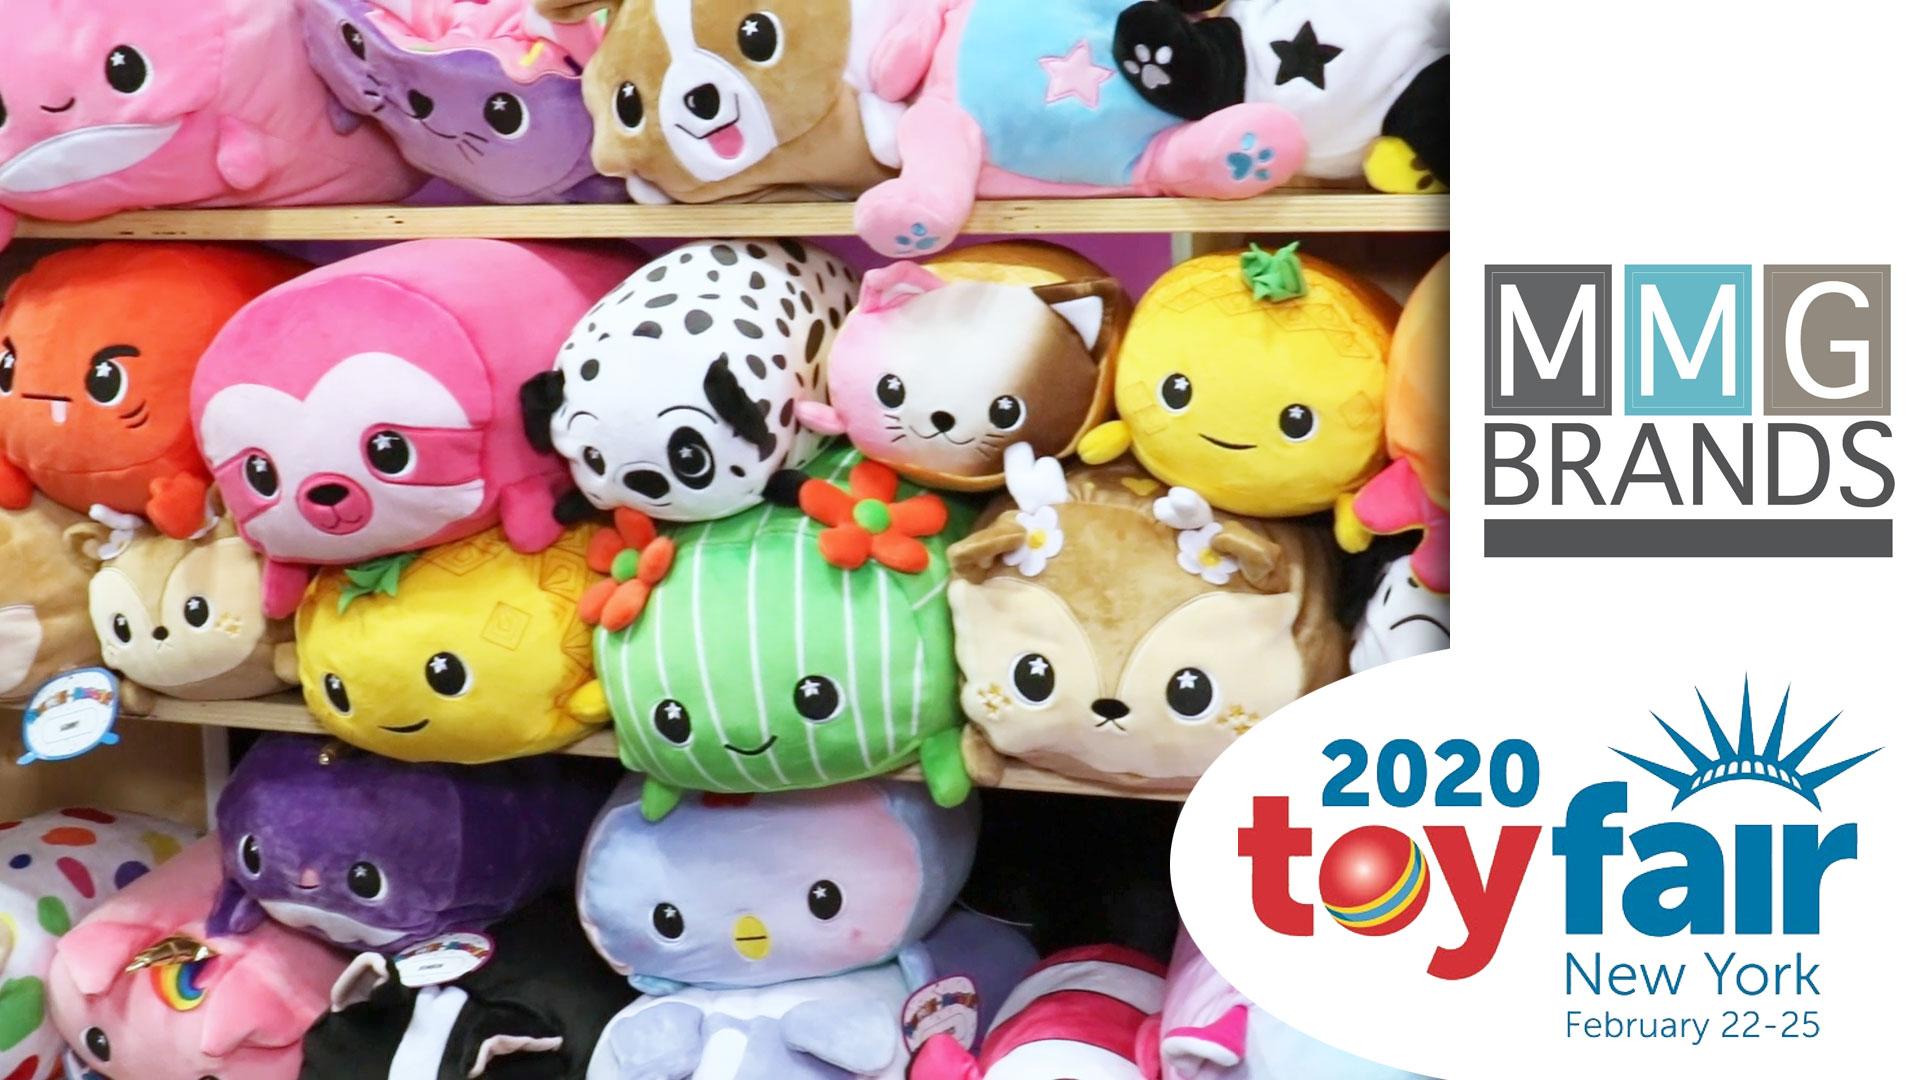 Moosh Moosh by MMG Brands @ Toy Fair 2020